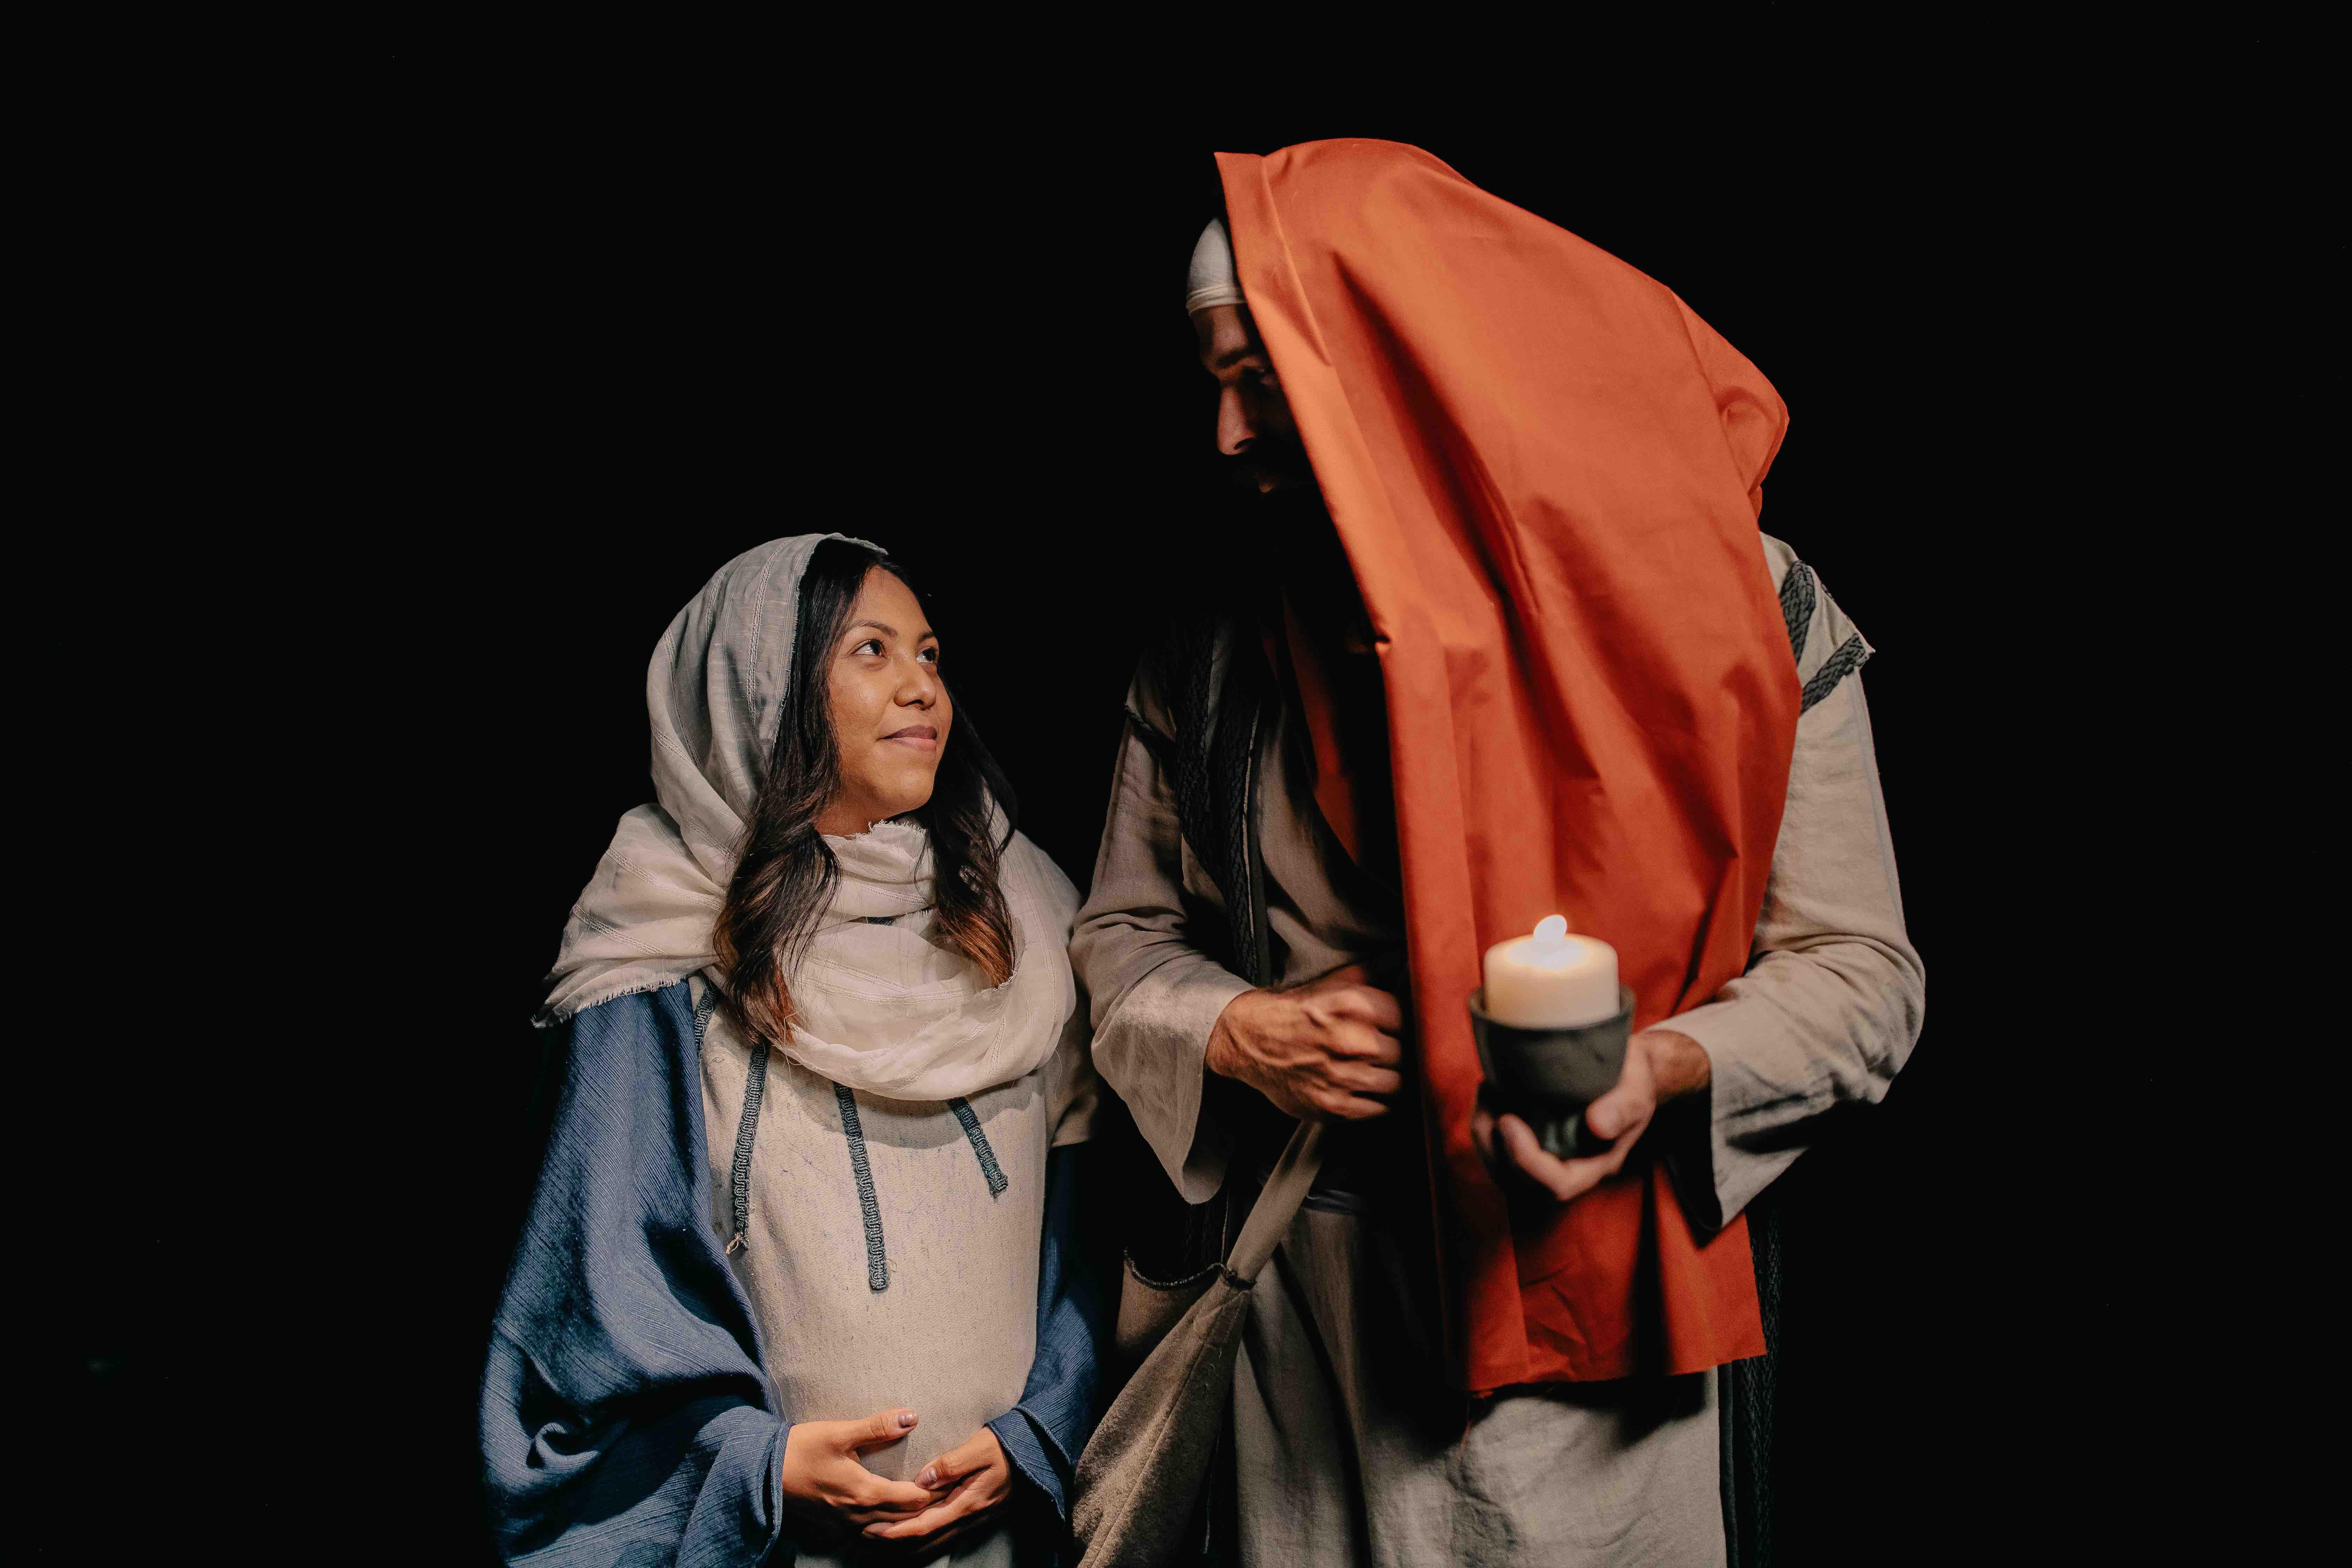 Christmas Creative: Powerful Portraits of Jesus' Birth